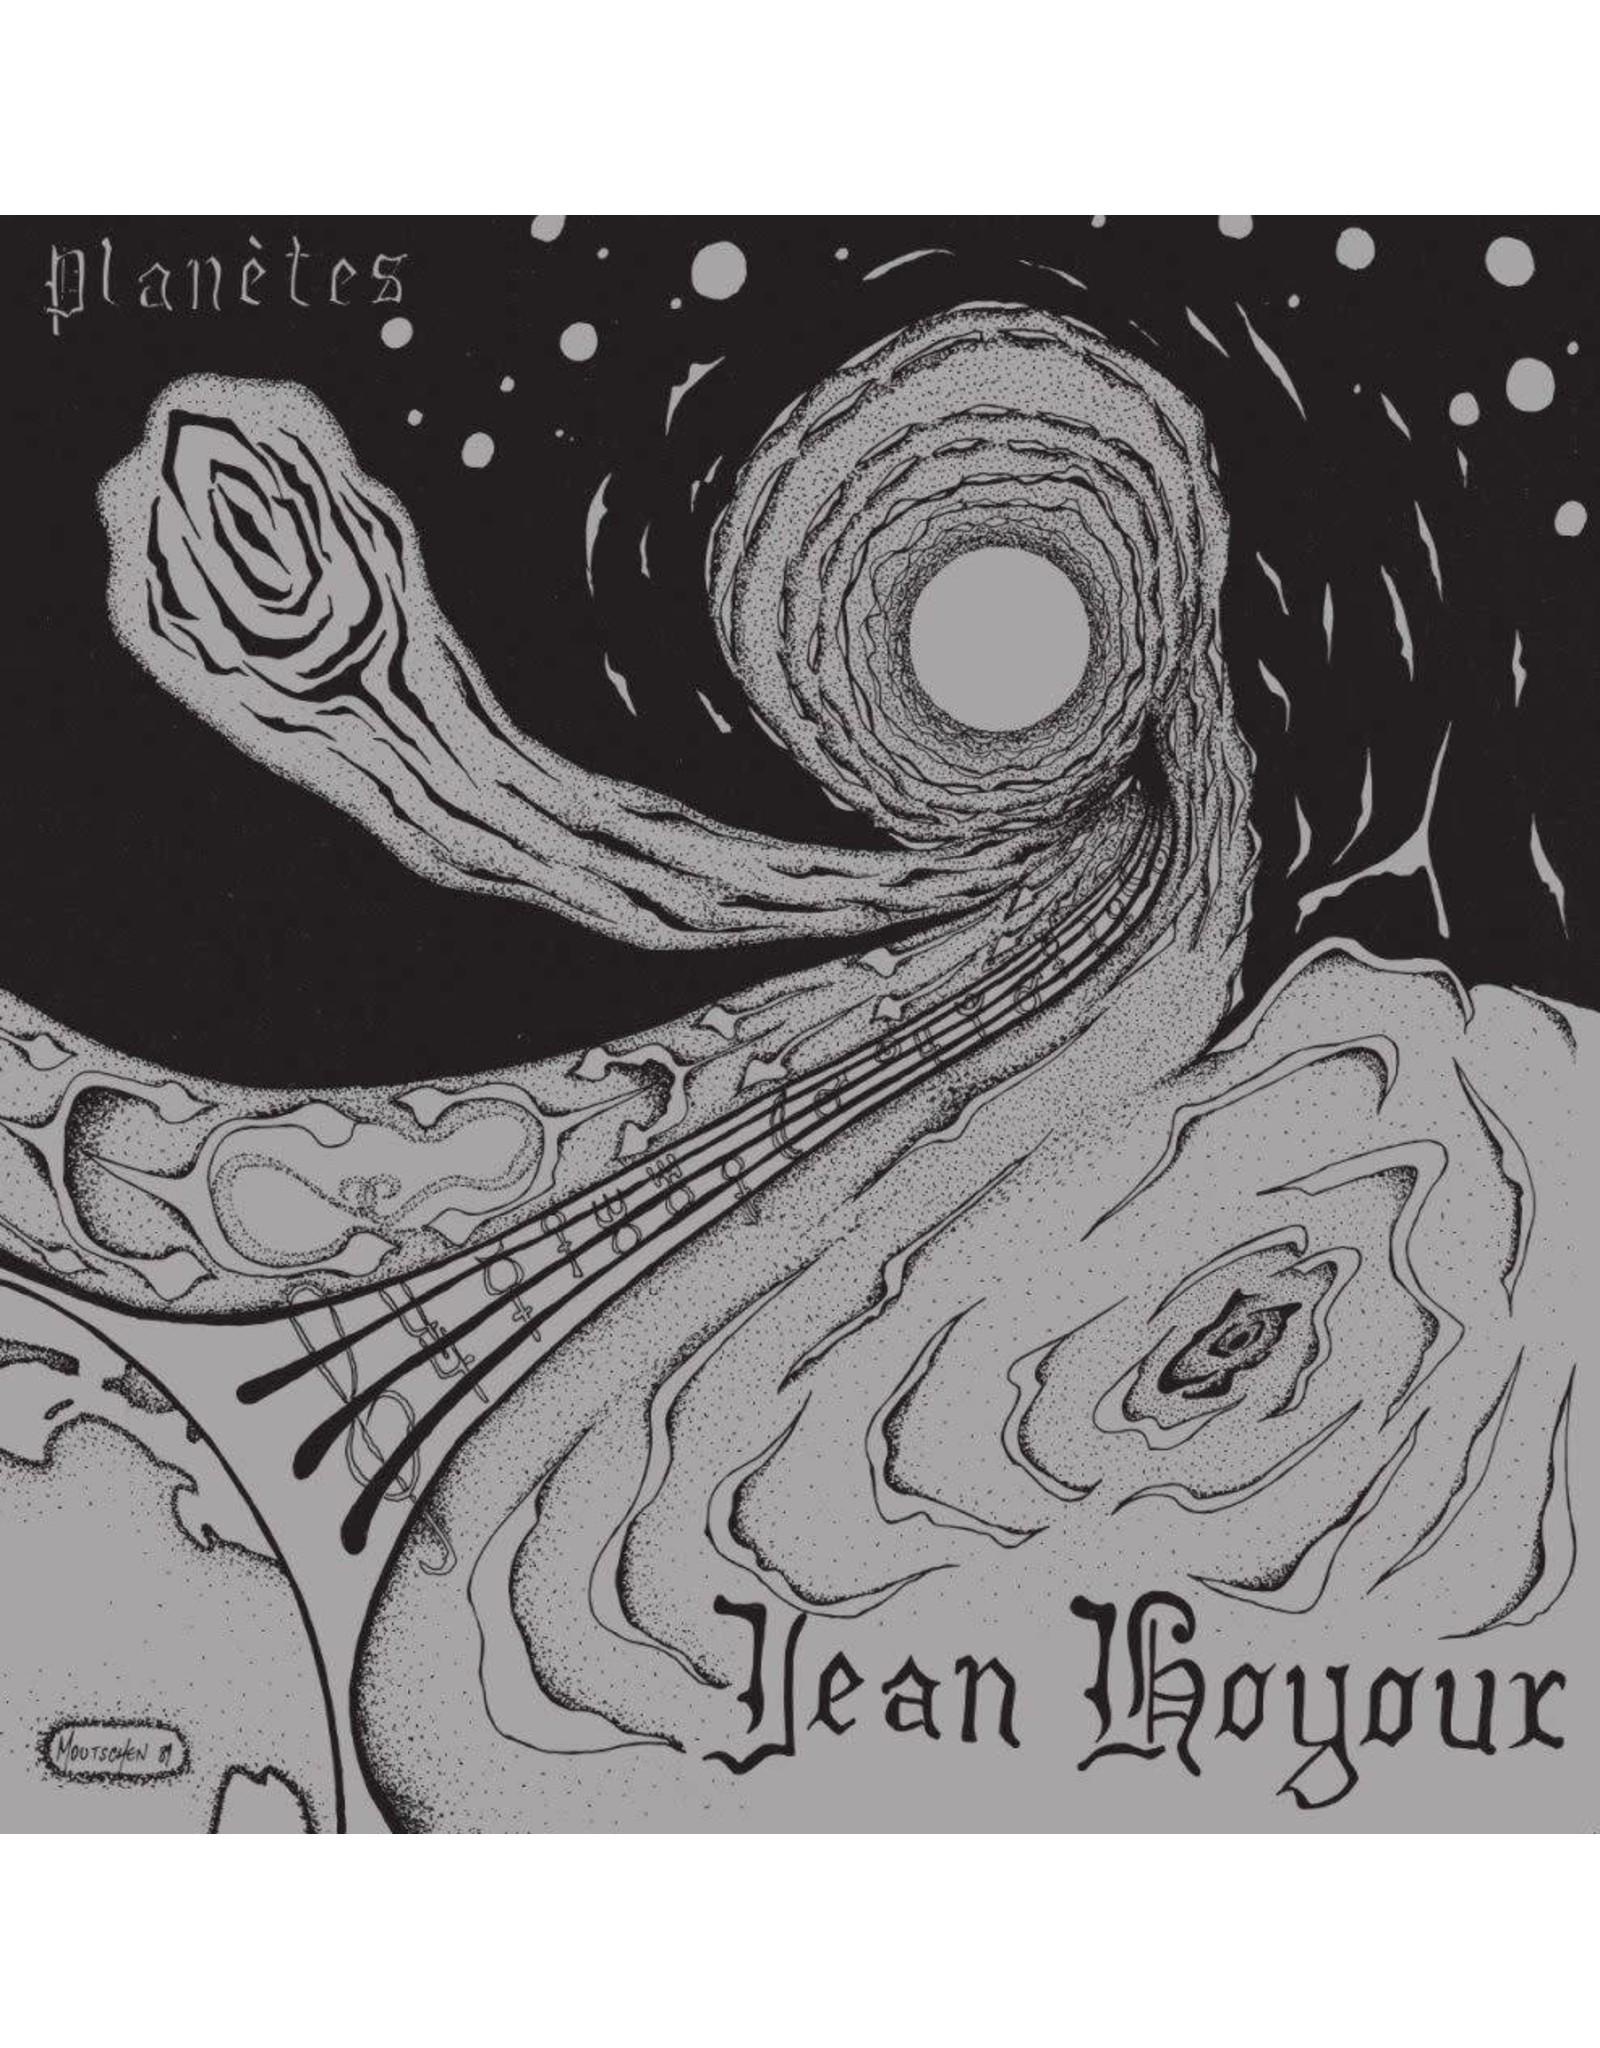 Cortizona Hoyoux, Jean: Planetes LP